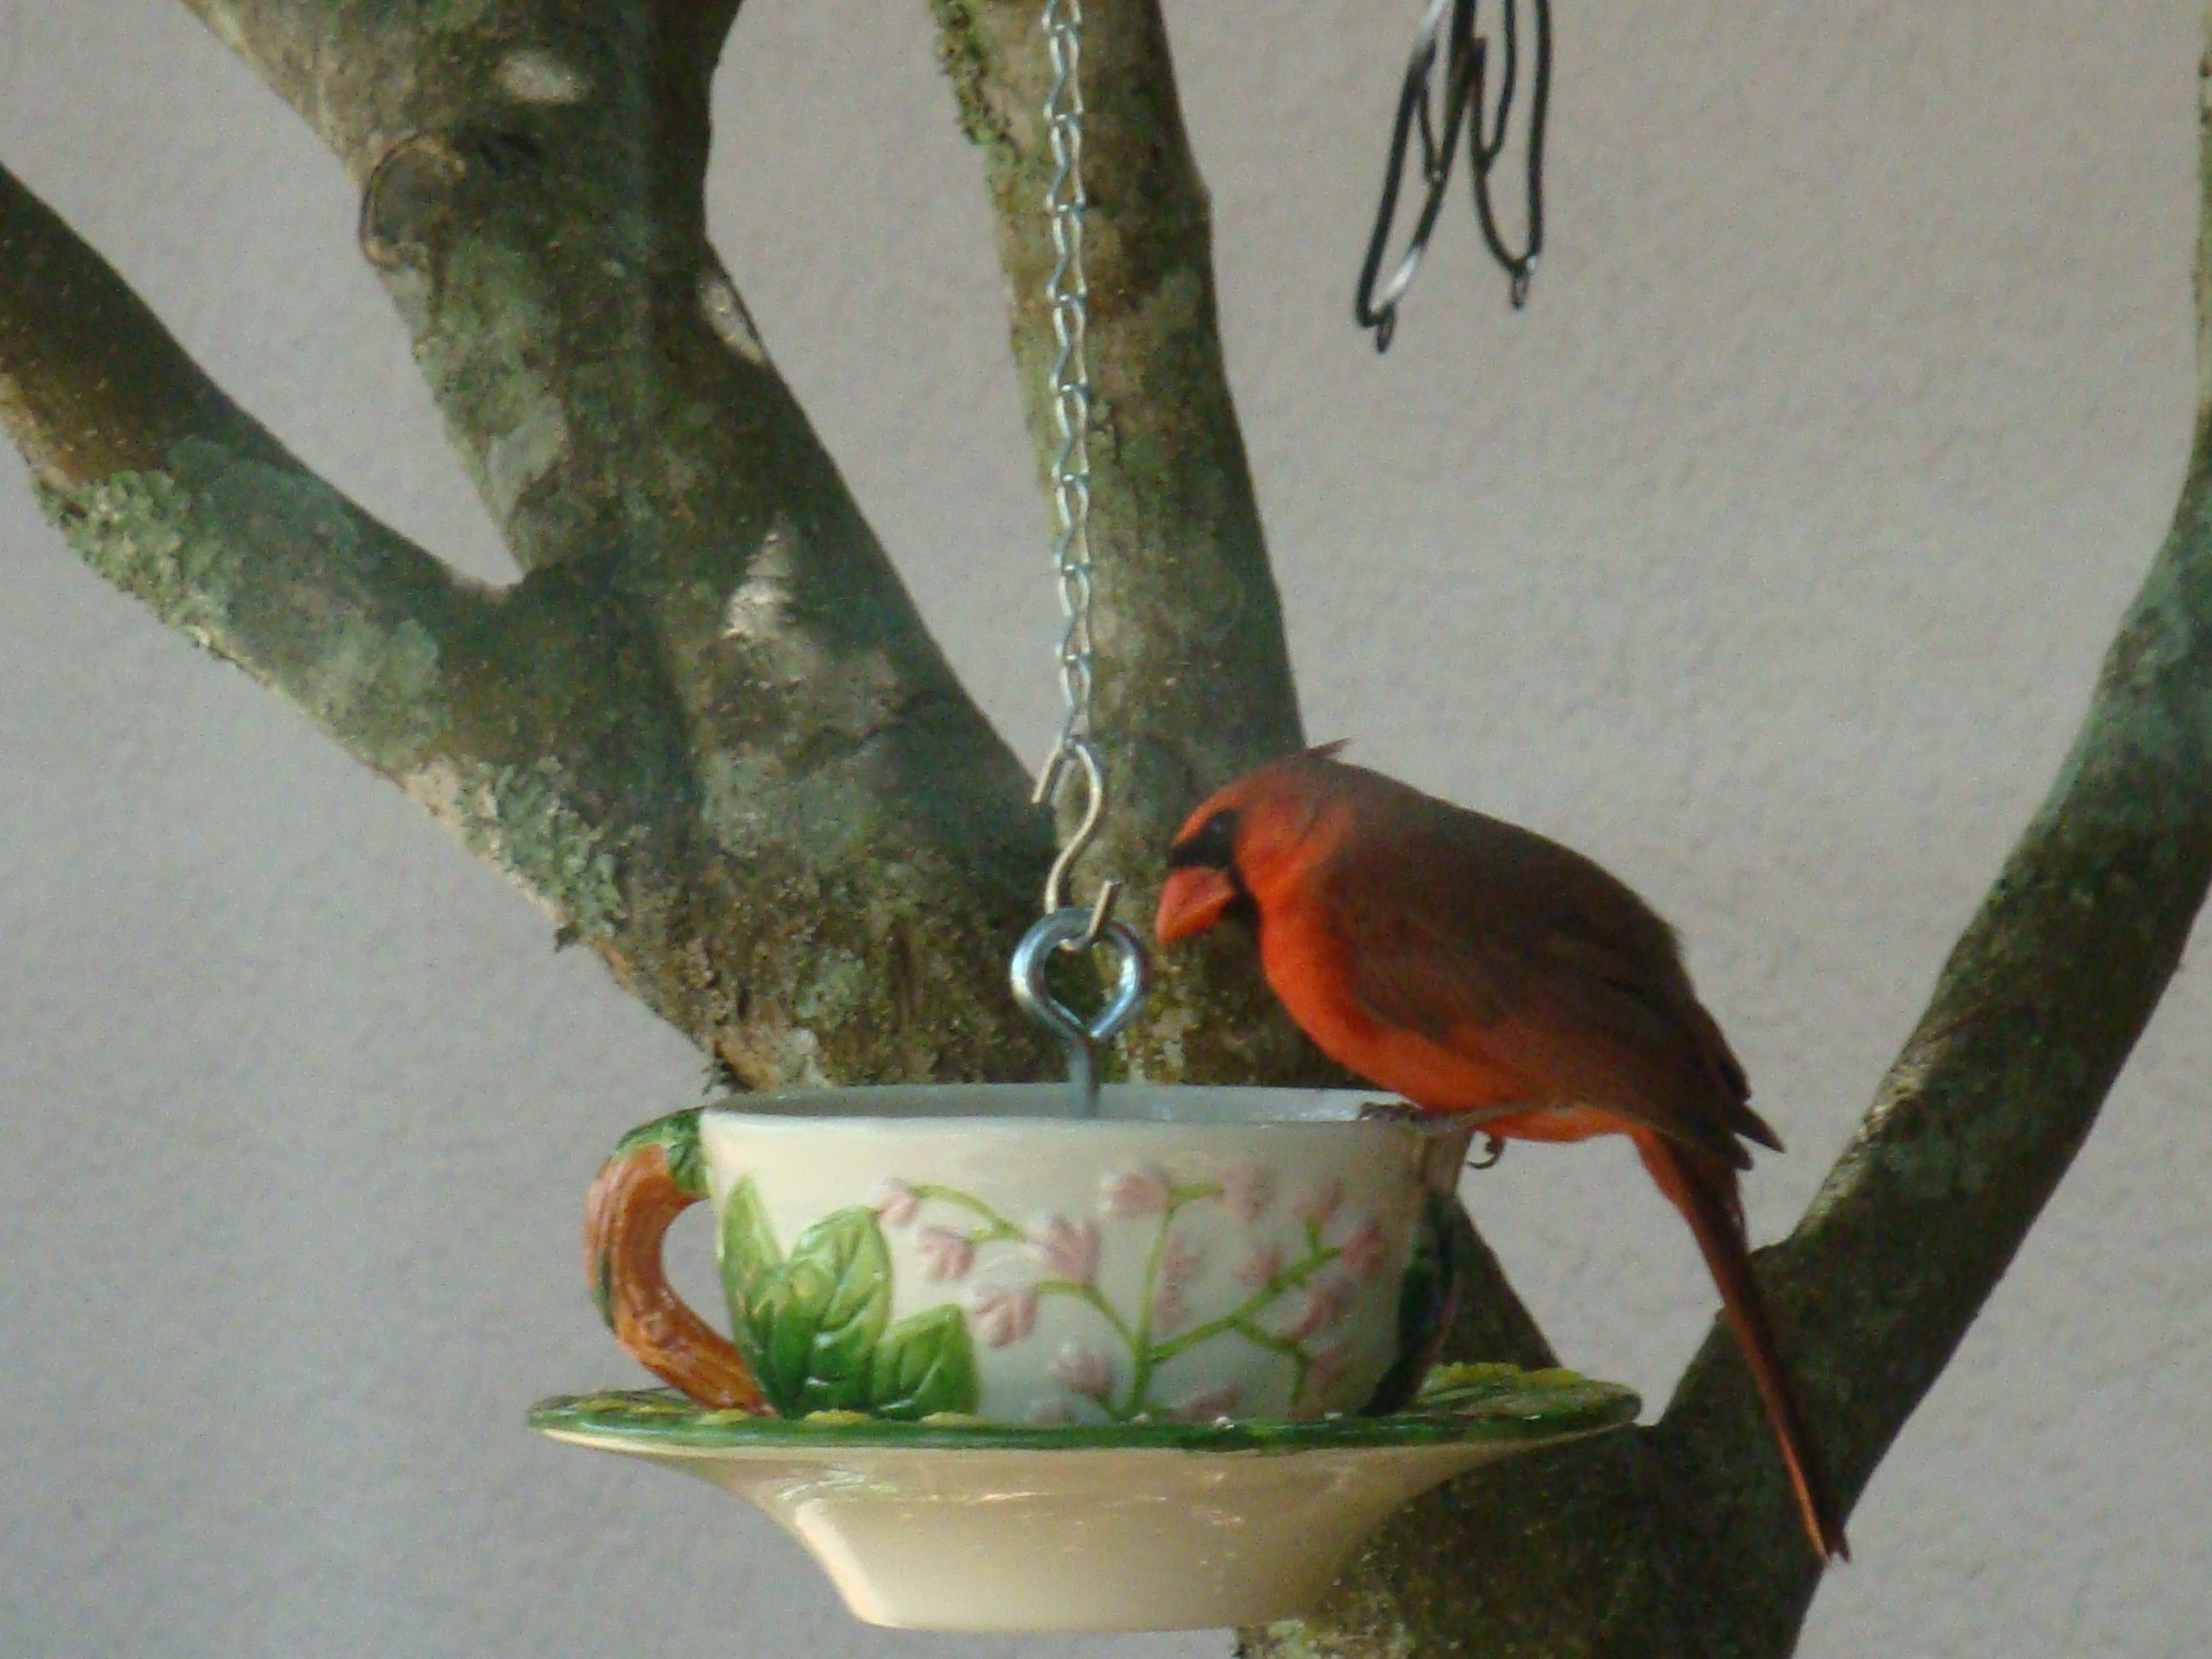 A tea cup bird feeder that i made